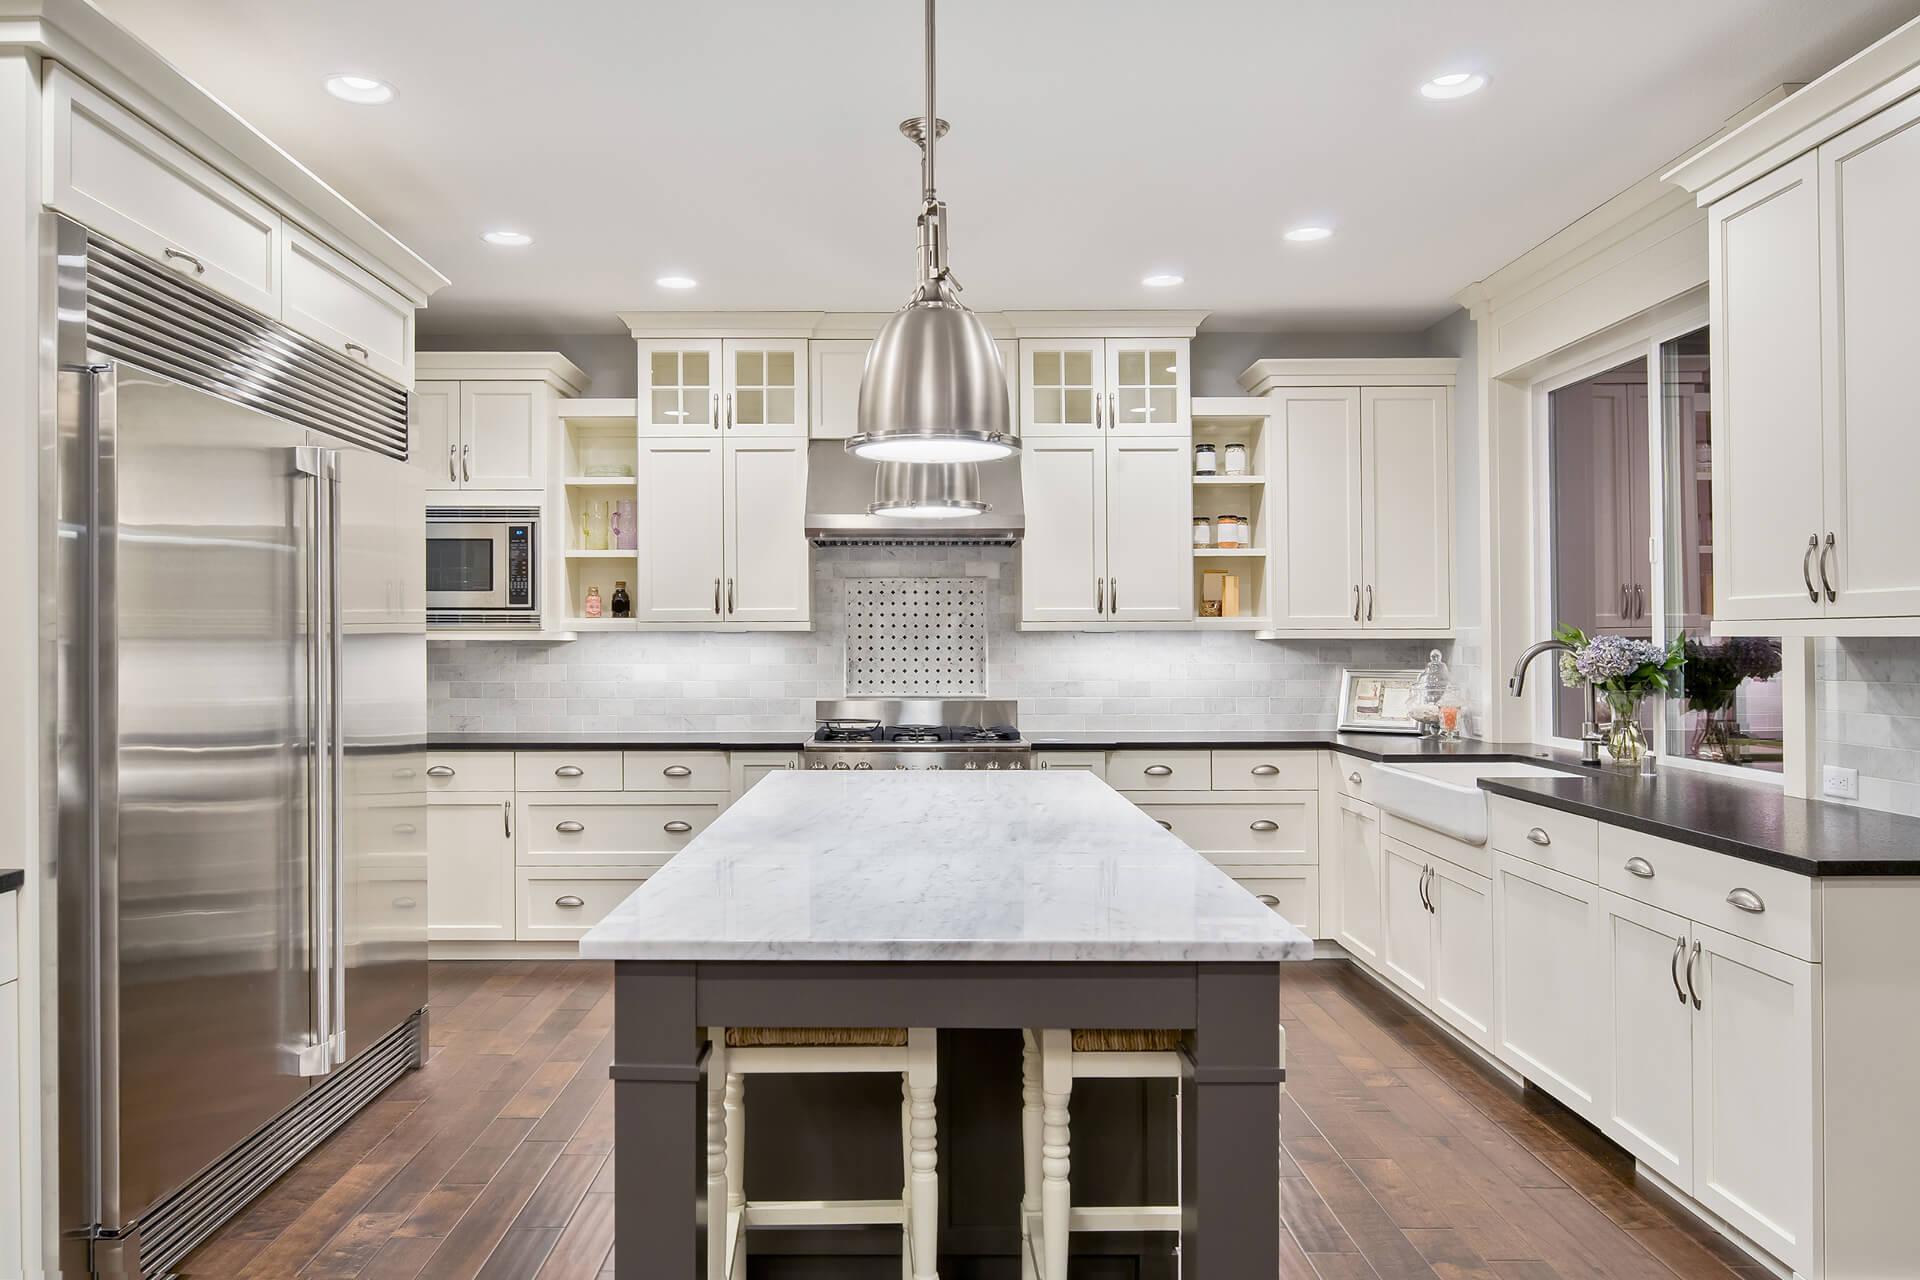 Kitchen Renovation Kitchen Marble Stainless Steel